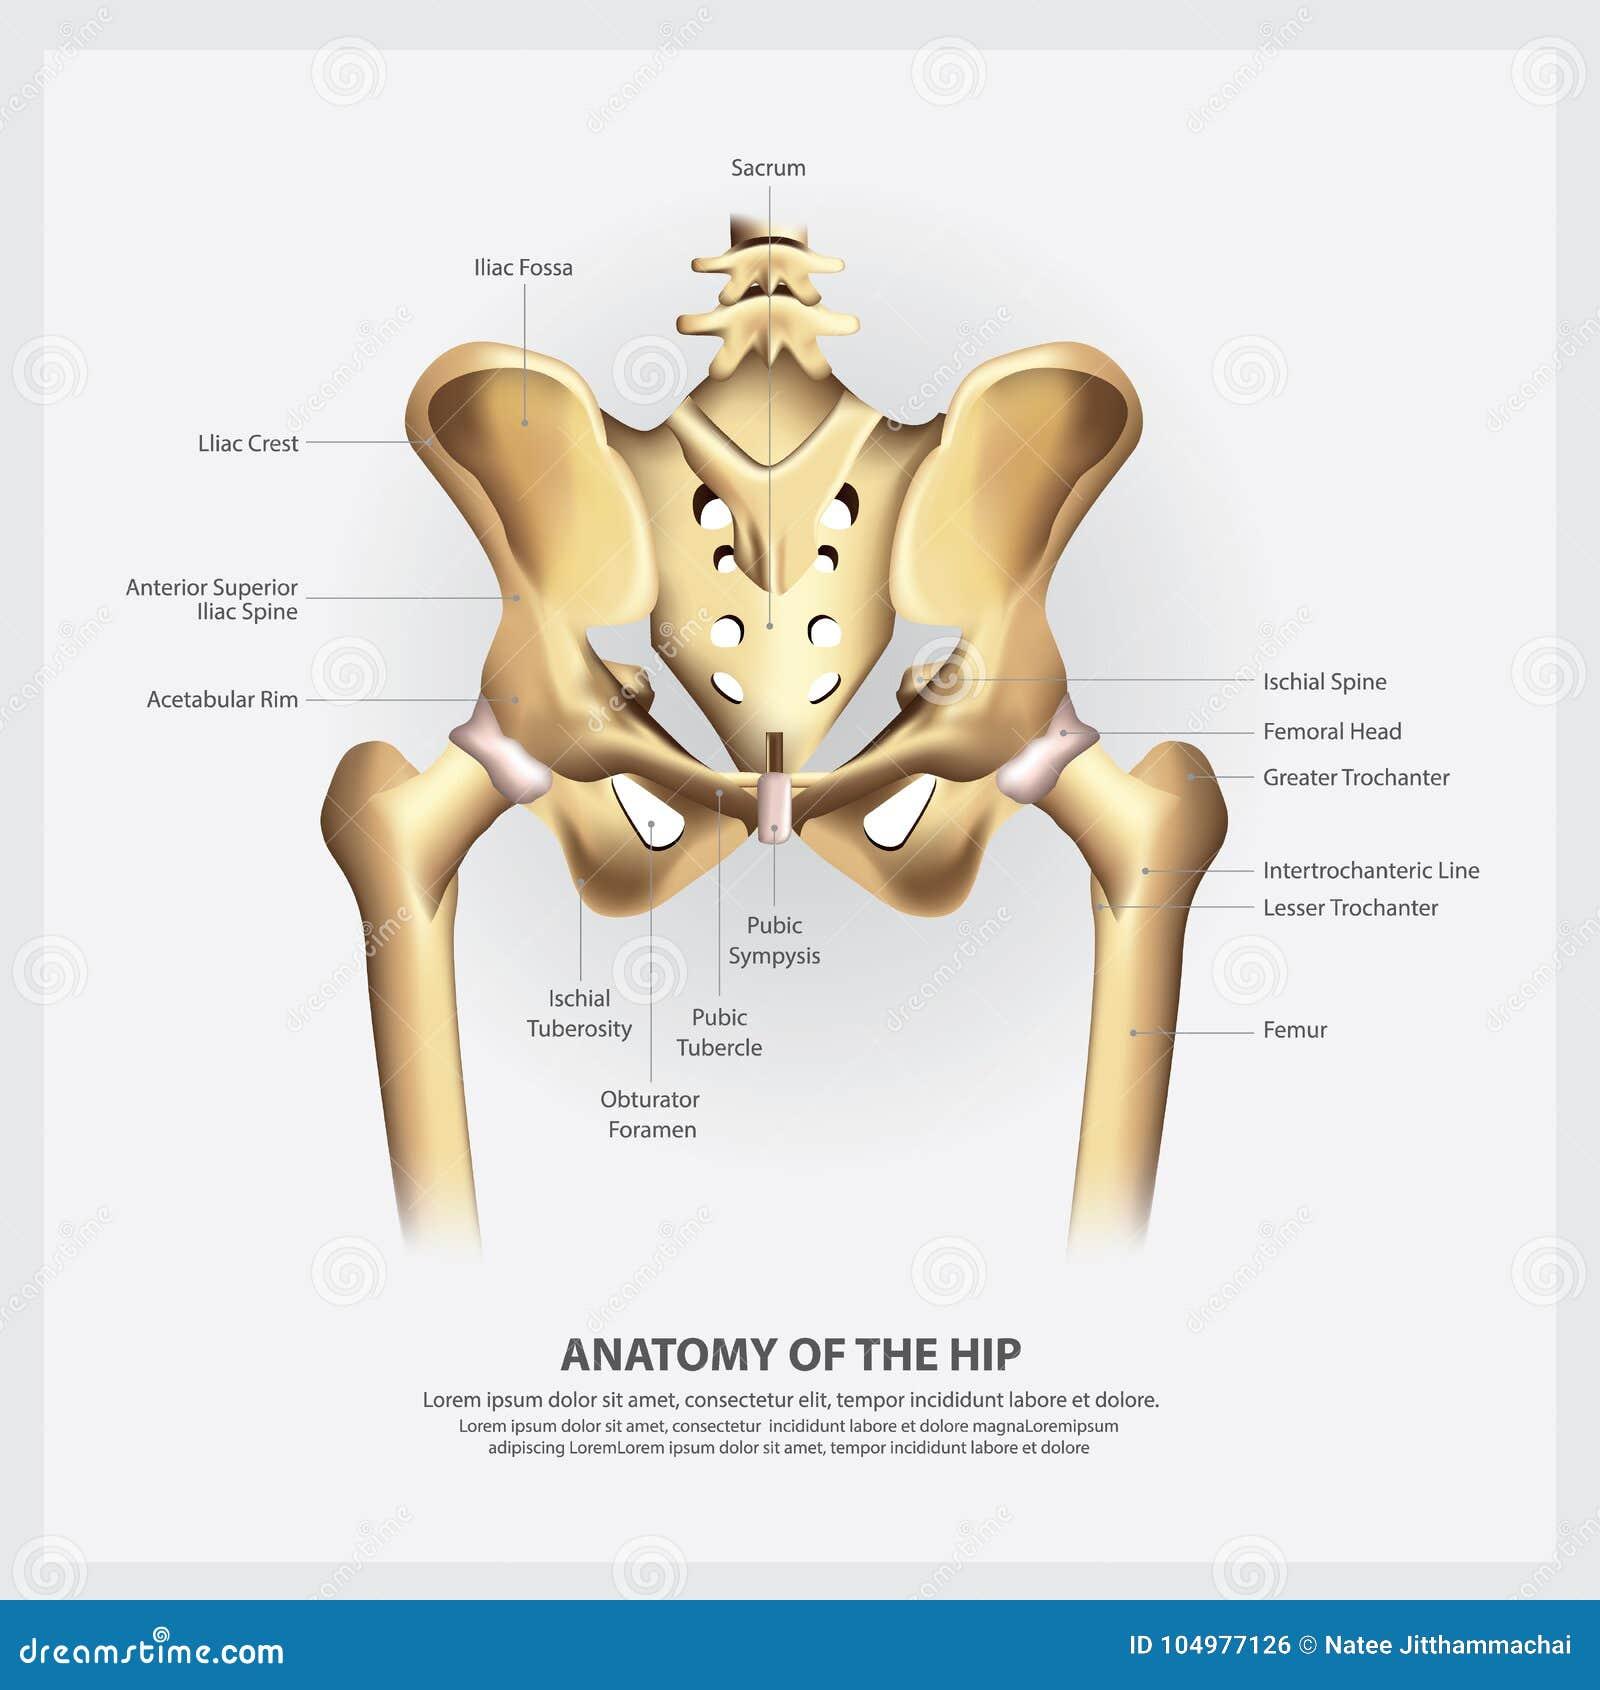 Human Anatomy of the Hip